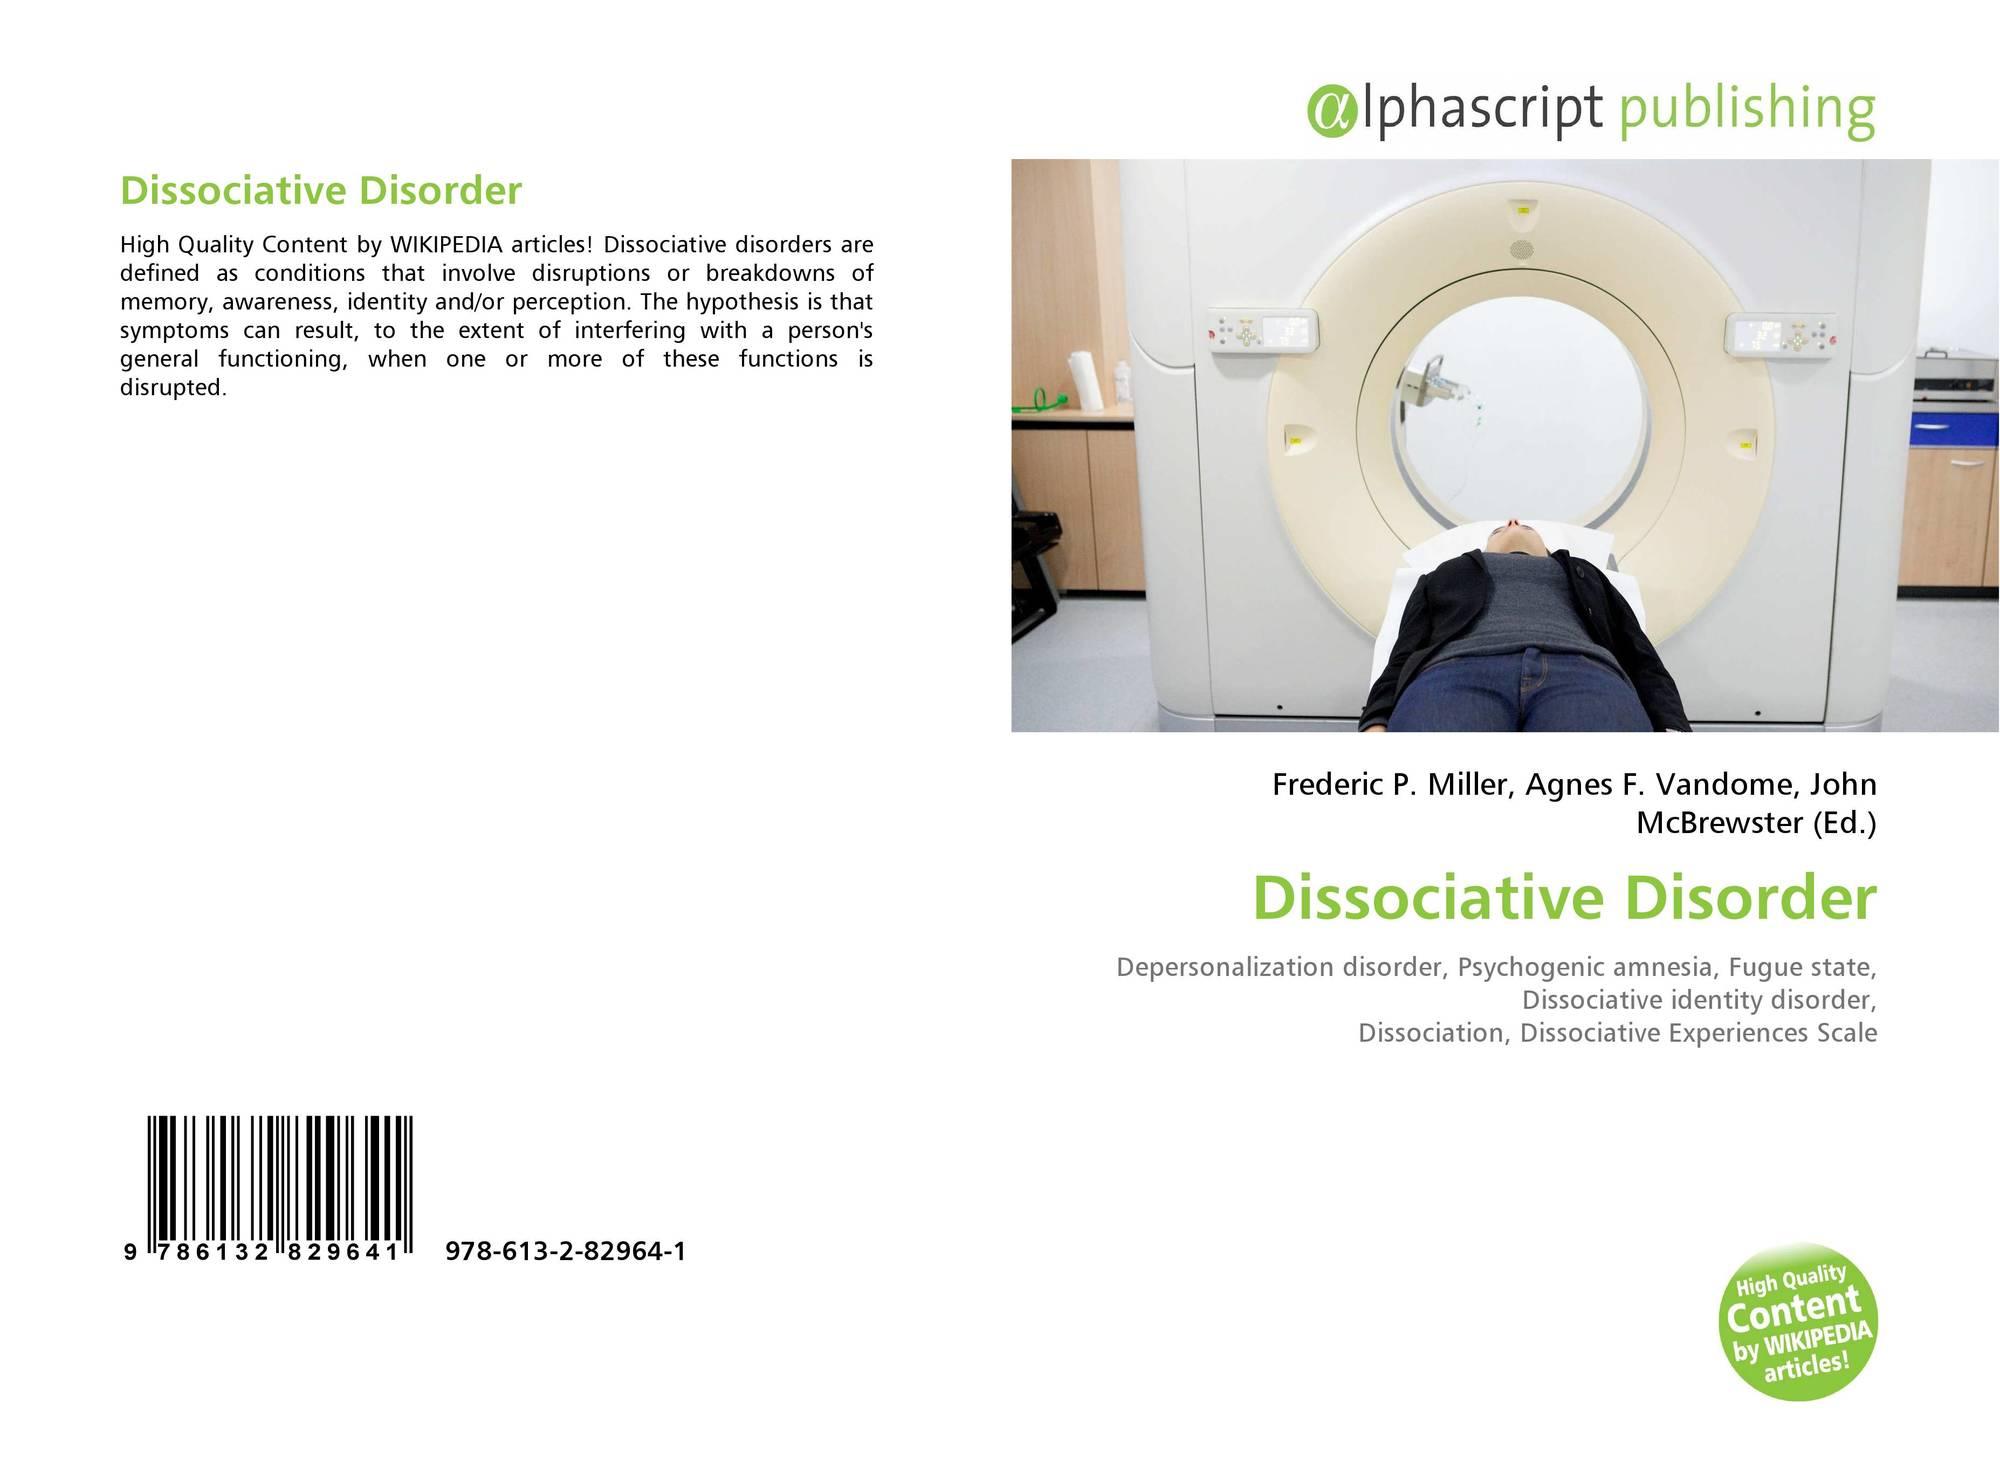 hypothesis on dissociative identity disorder